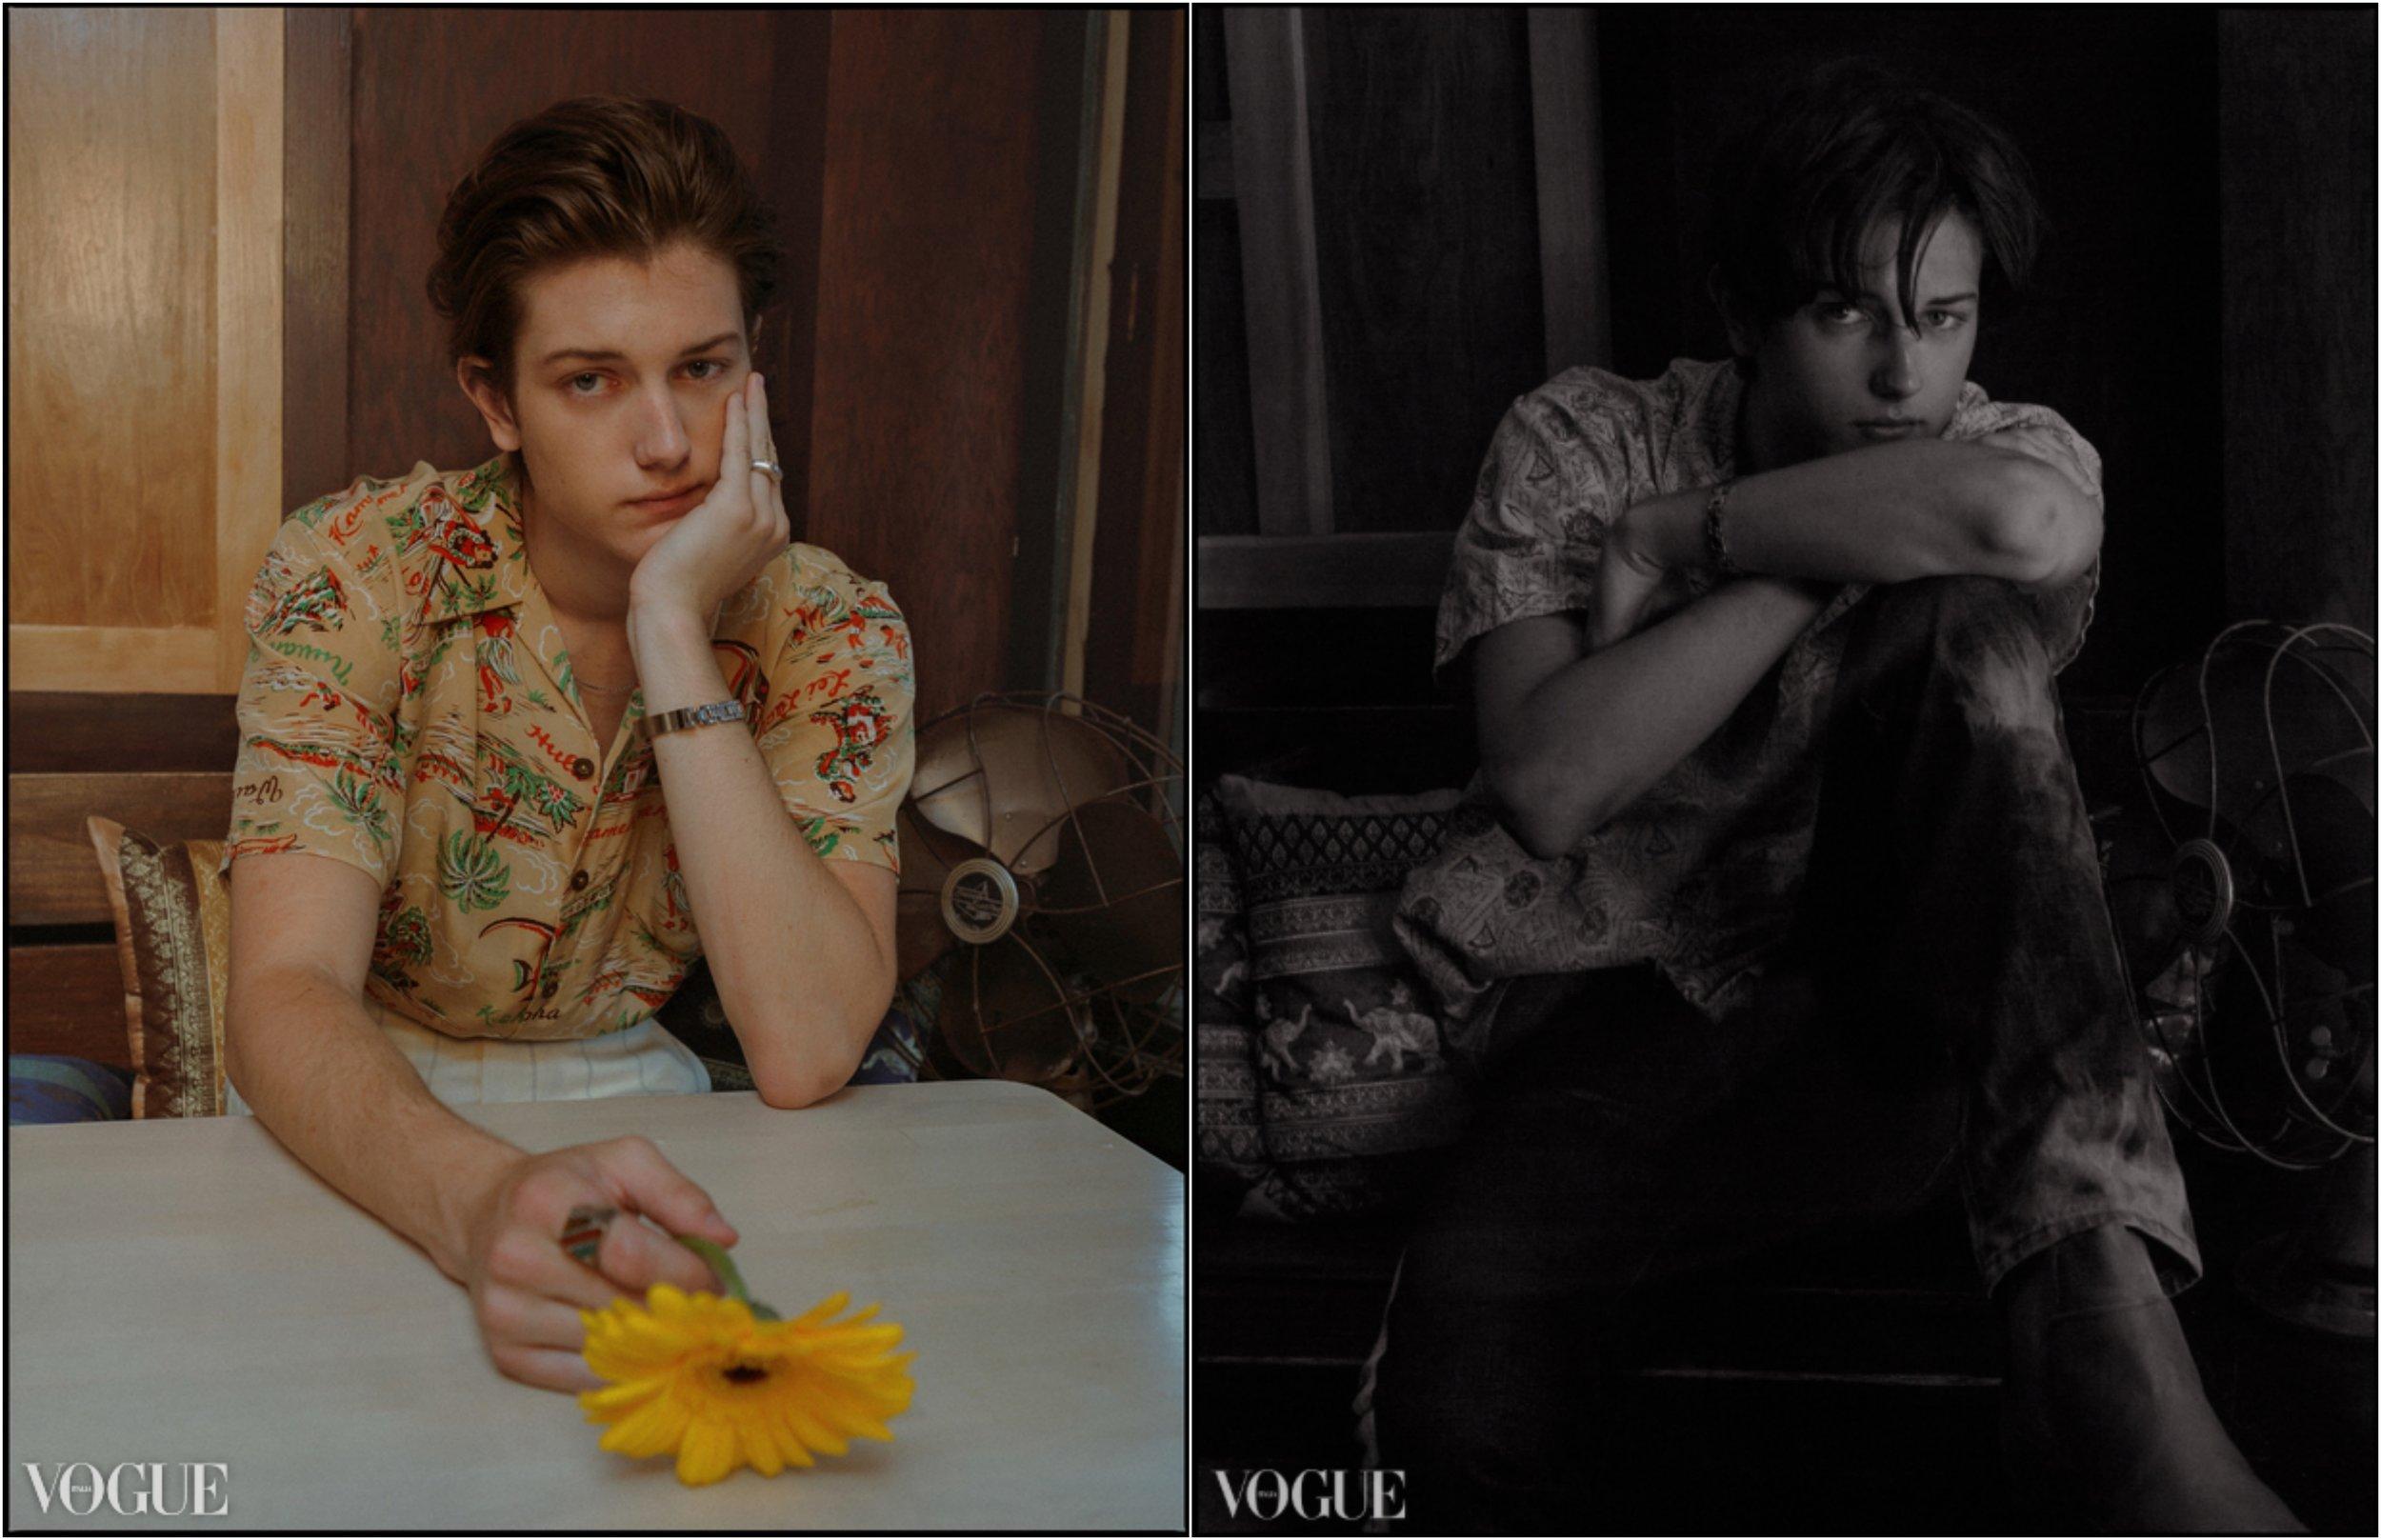 Vogue.it - Sam Evans